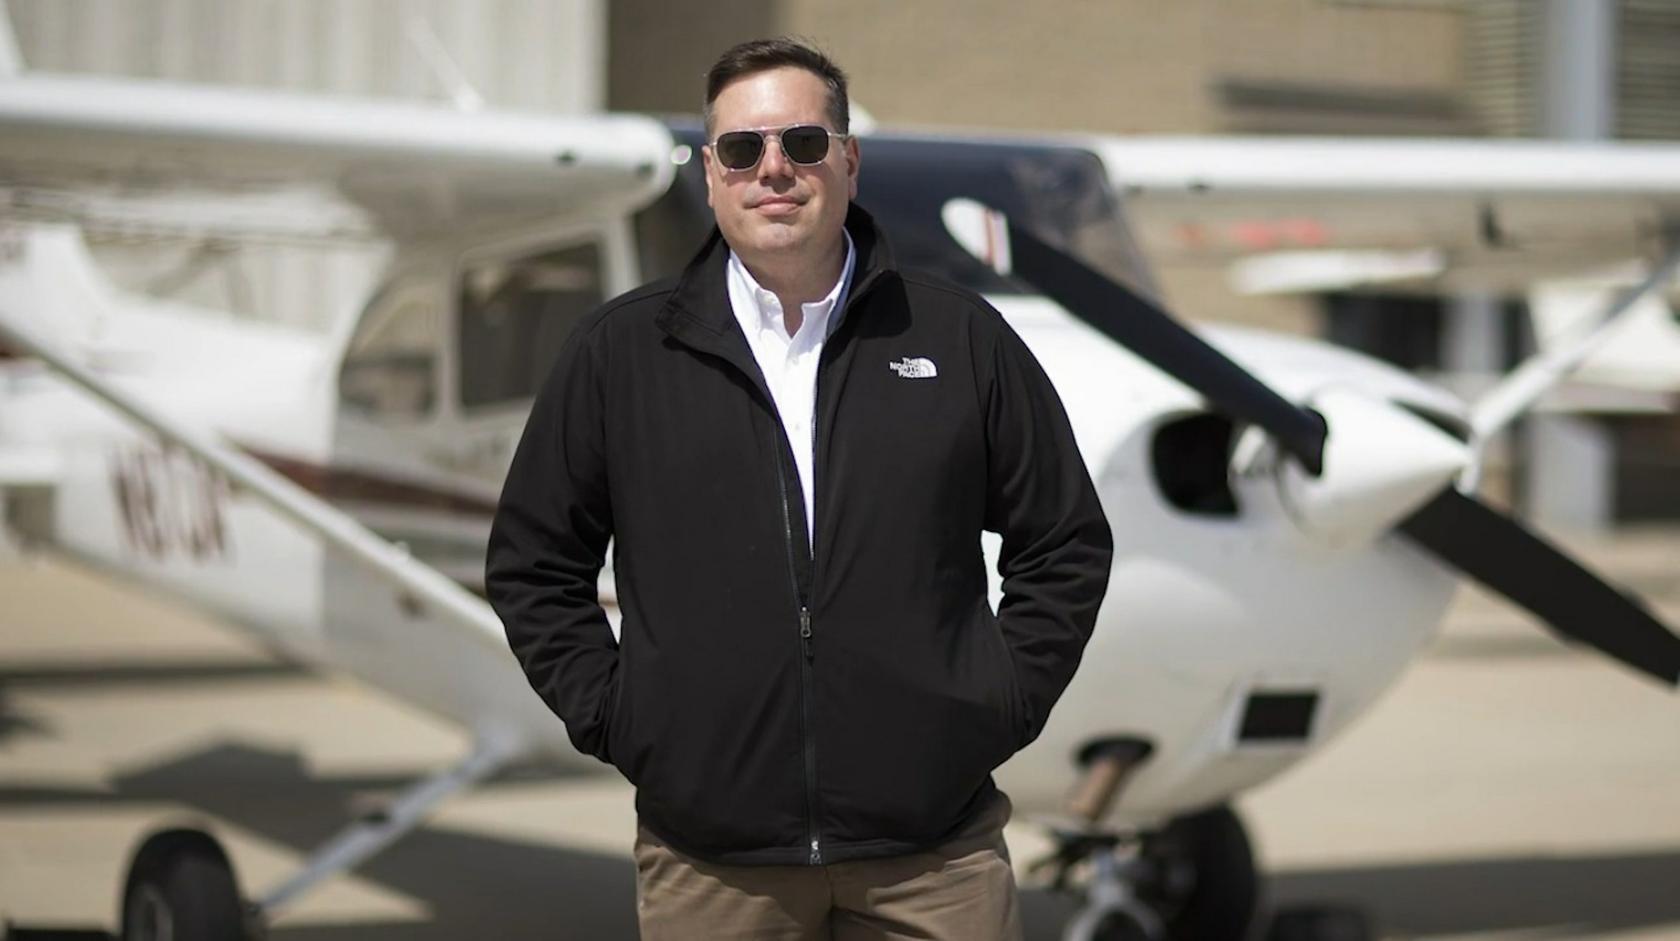 RodRakic.OpenAirplane.Otto.TechInChicago.Podcast